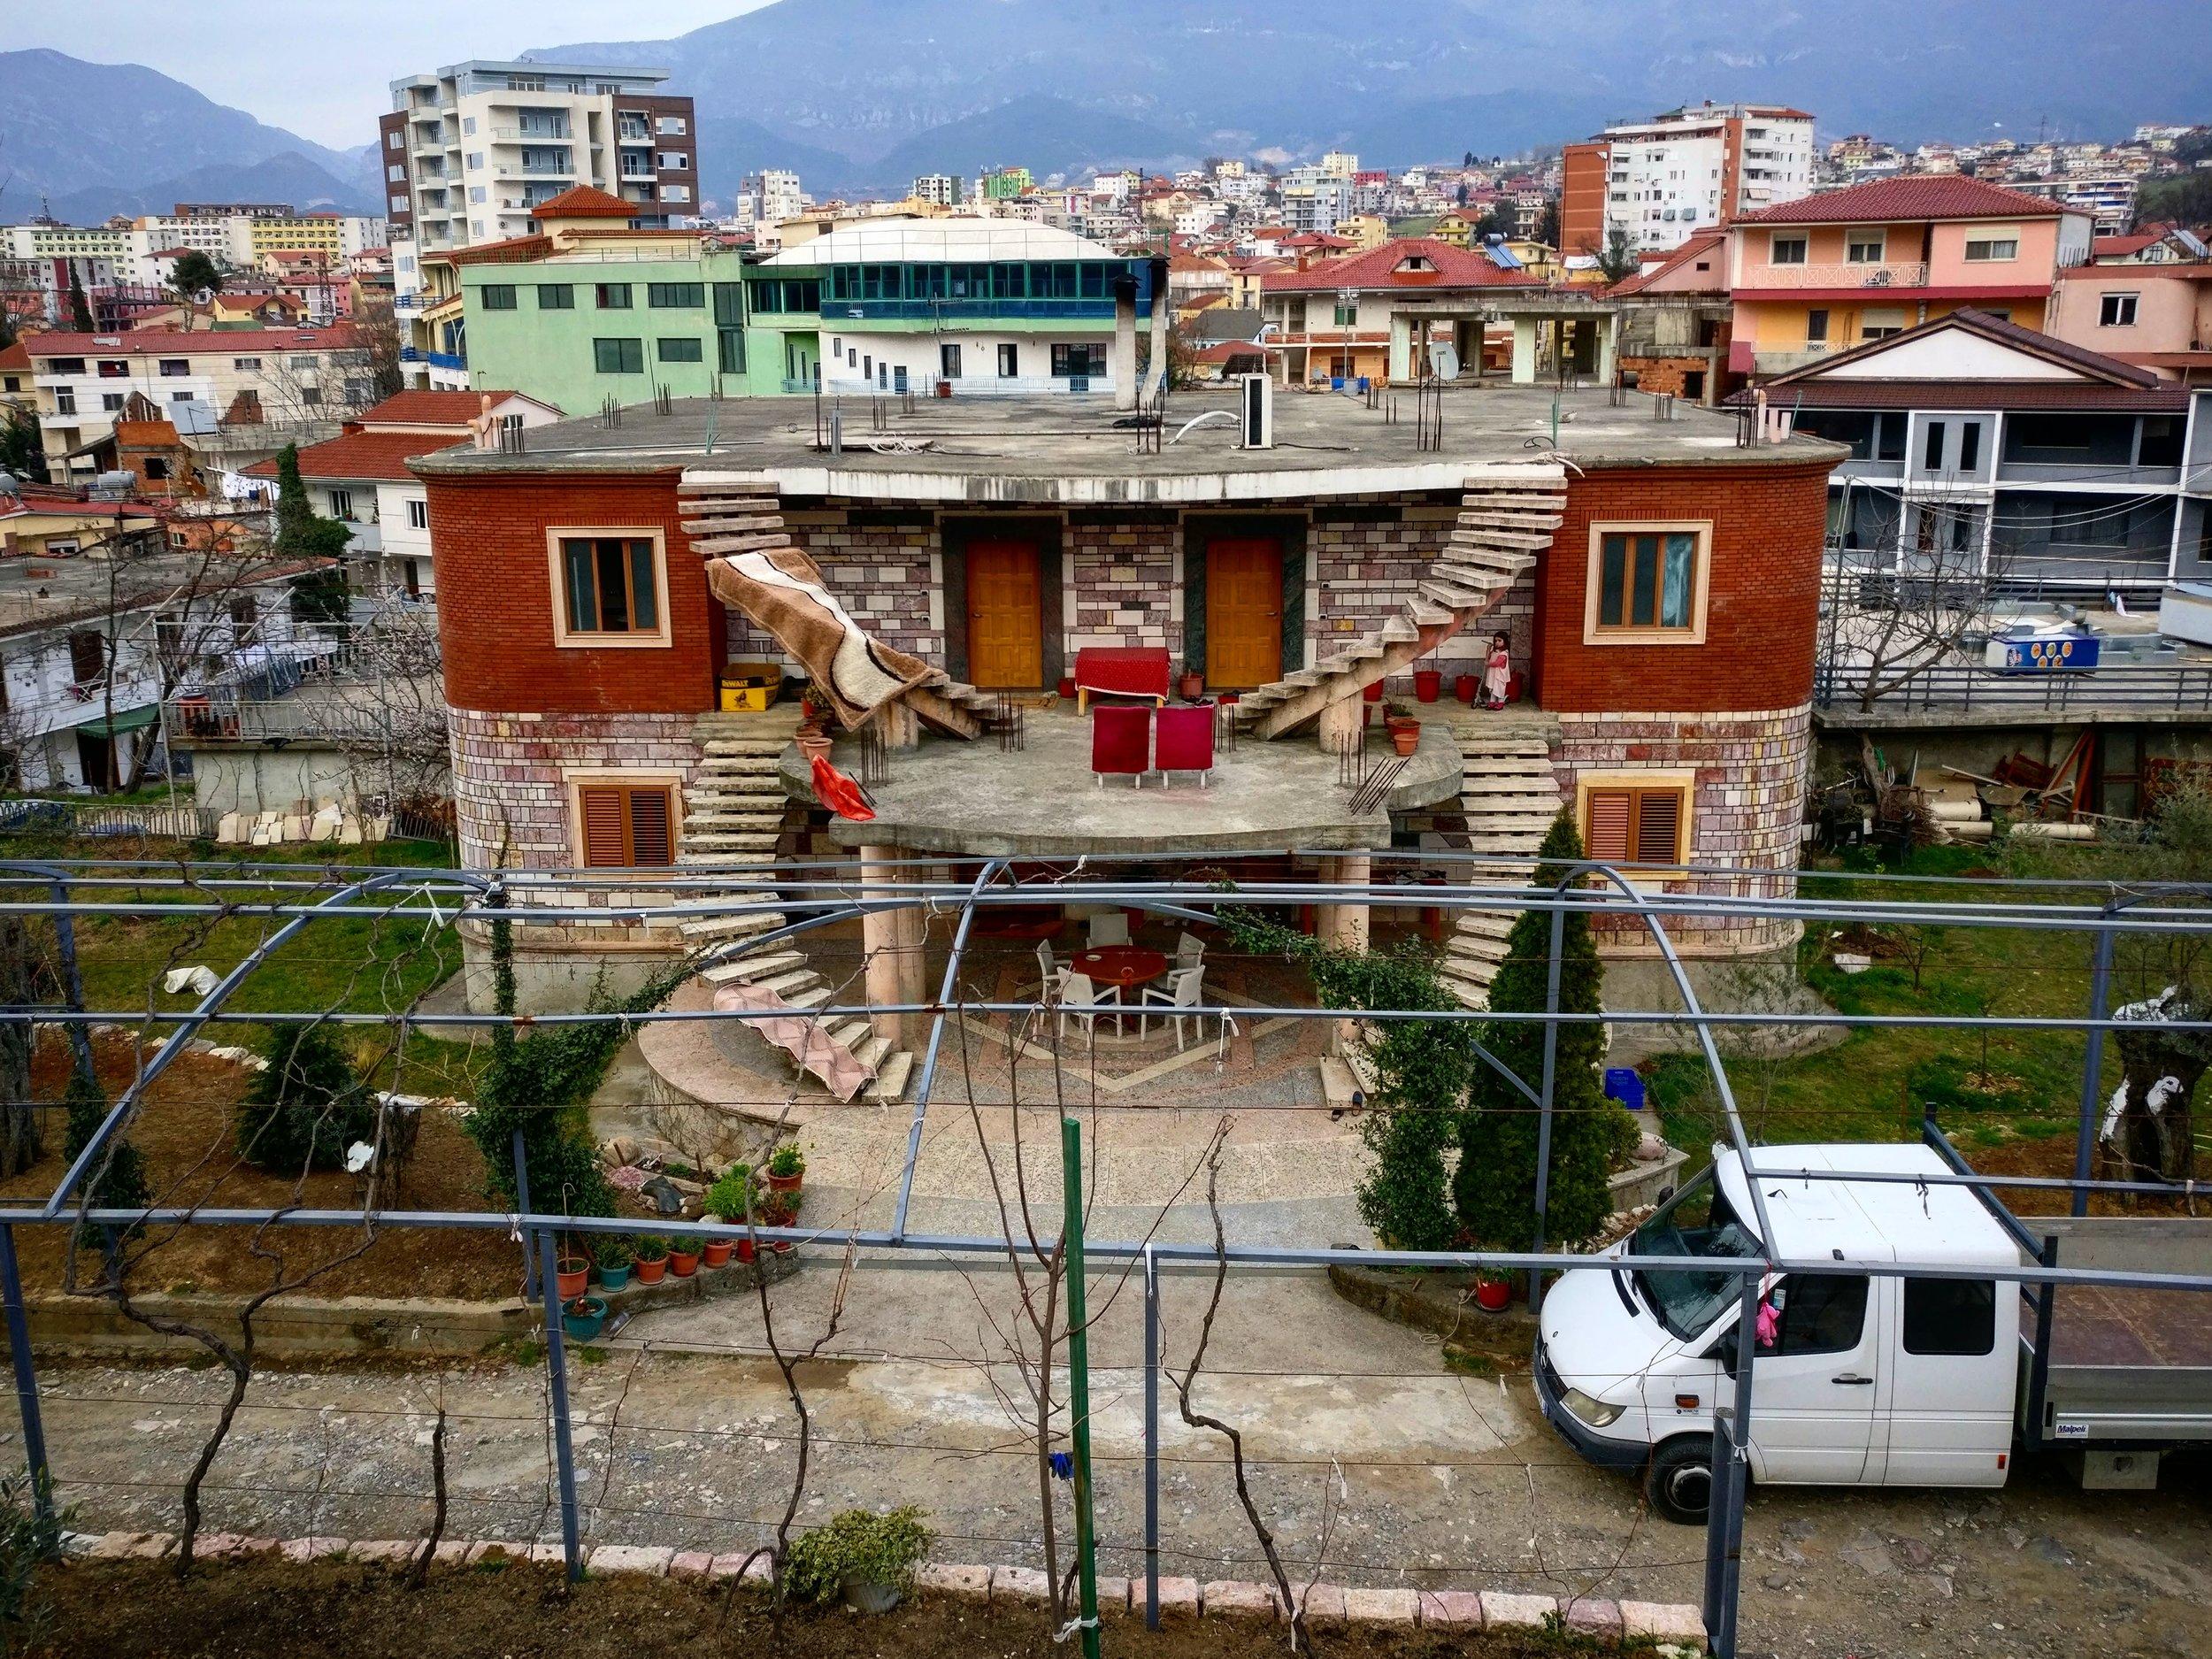 Communist-style housing